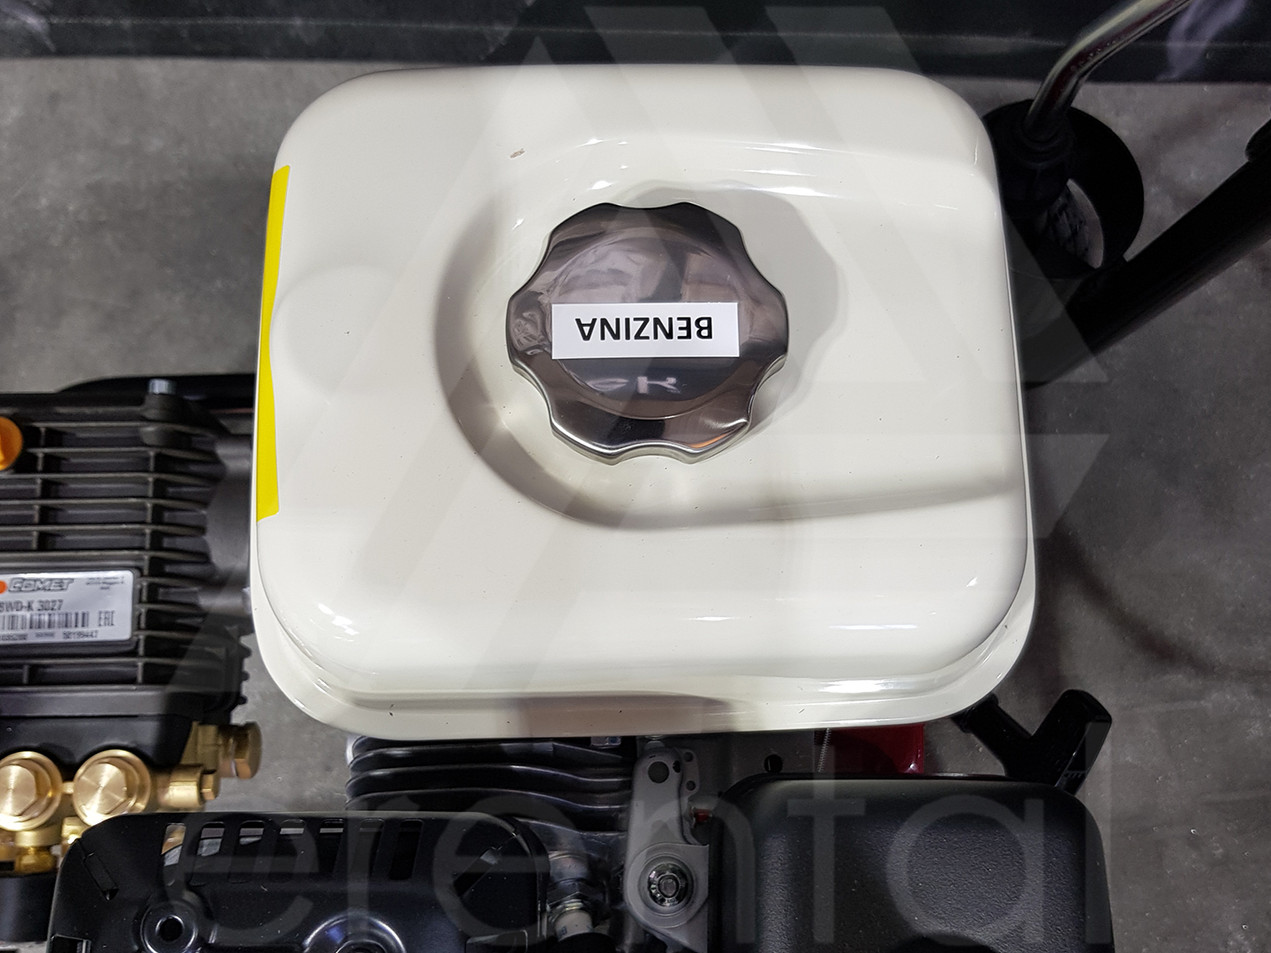 FDX2 13/180 a benzina ad acqua fredda